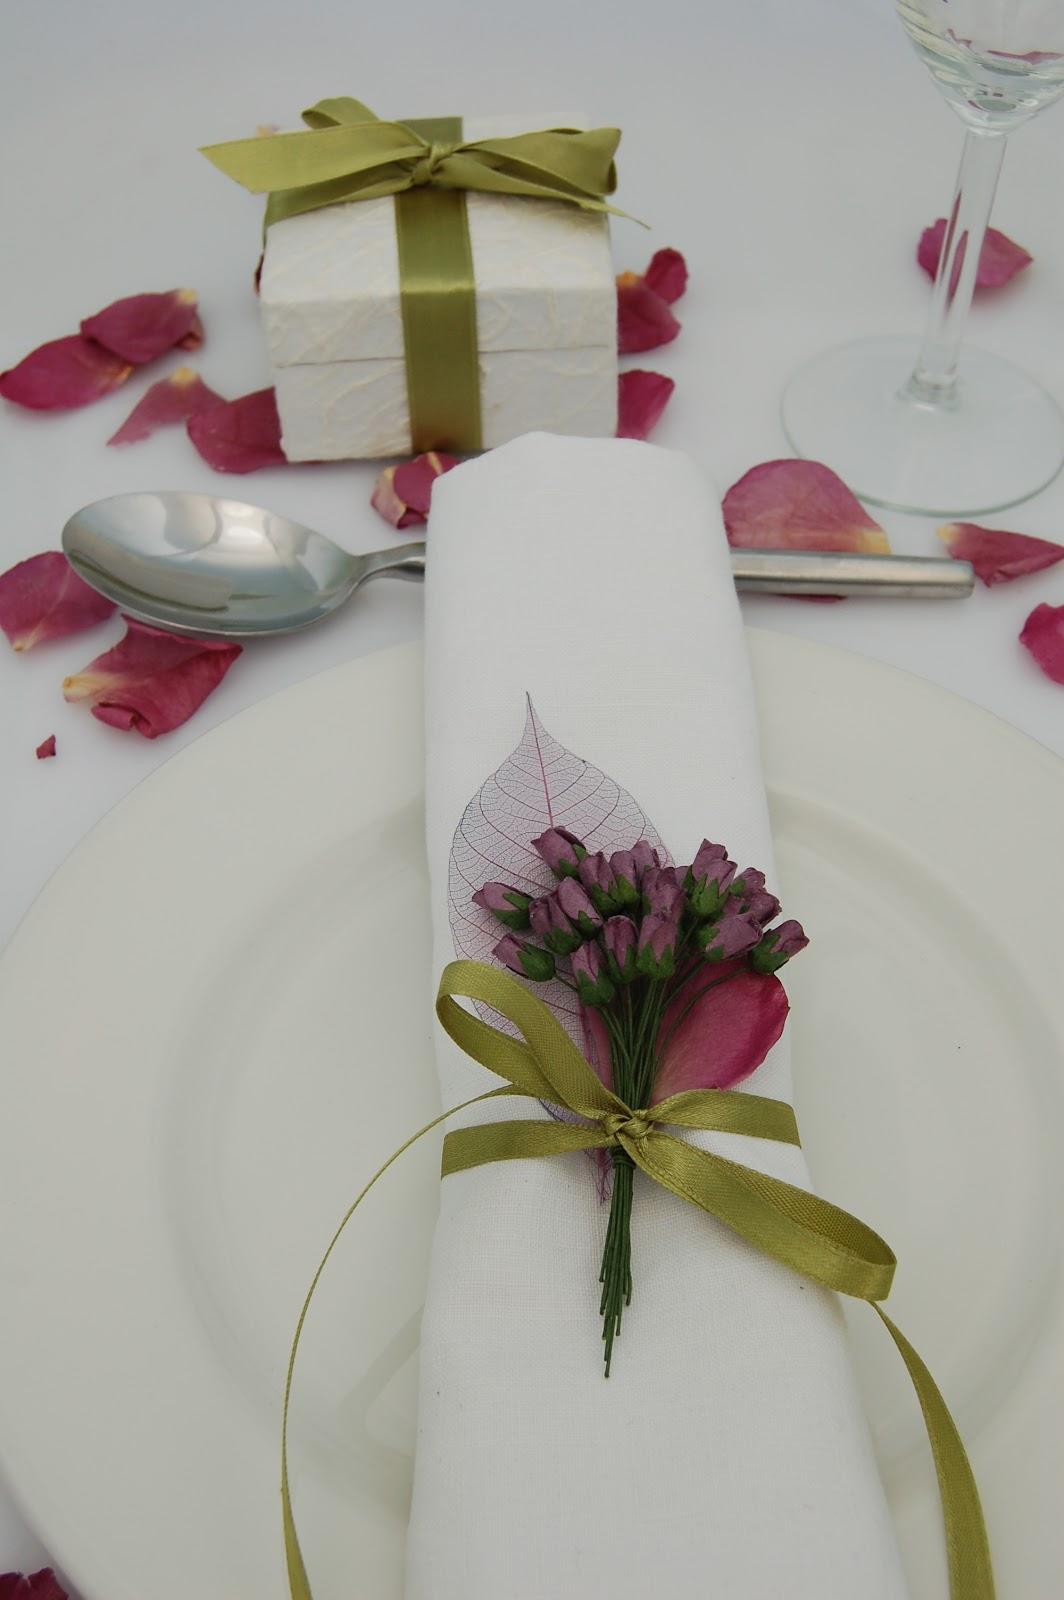 the confetti blog purple wedding themes ideas flowers and confetti petals. Black Bedroom Furniture Sets. Home Design Ideas